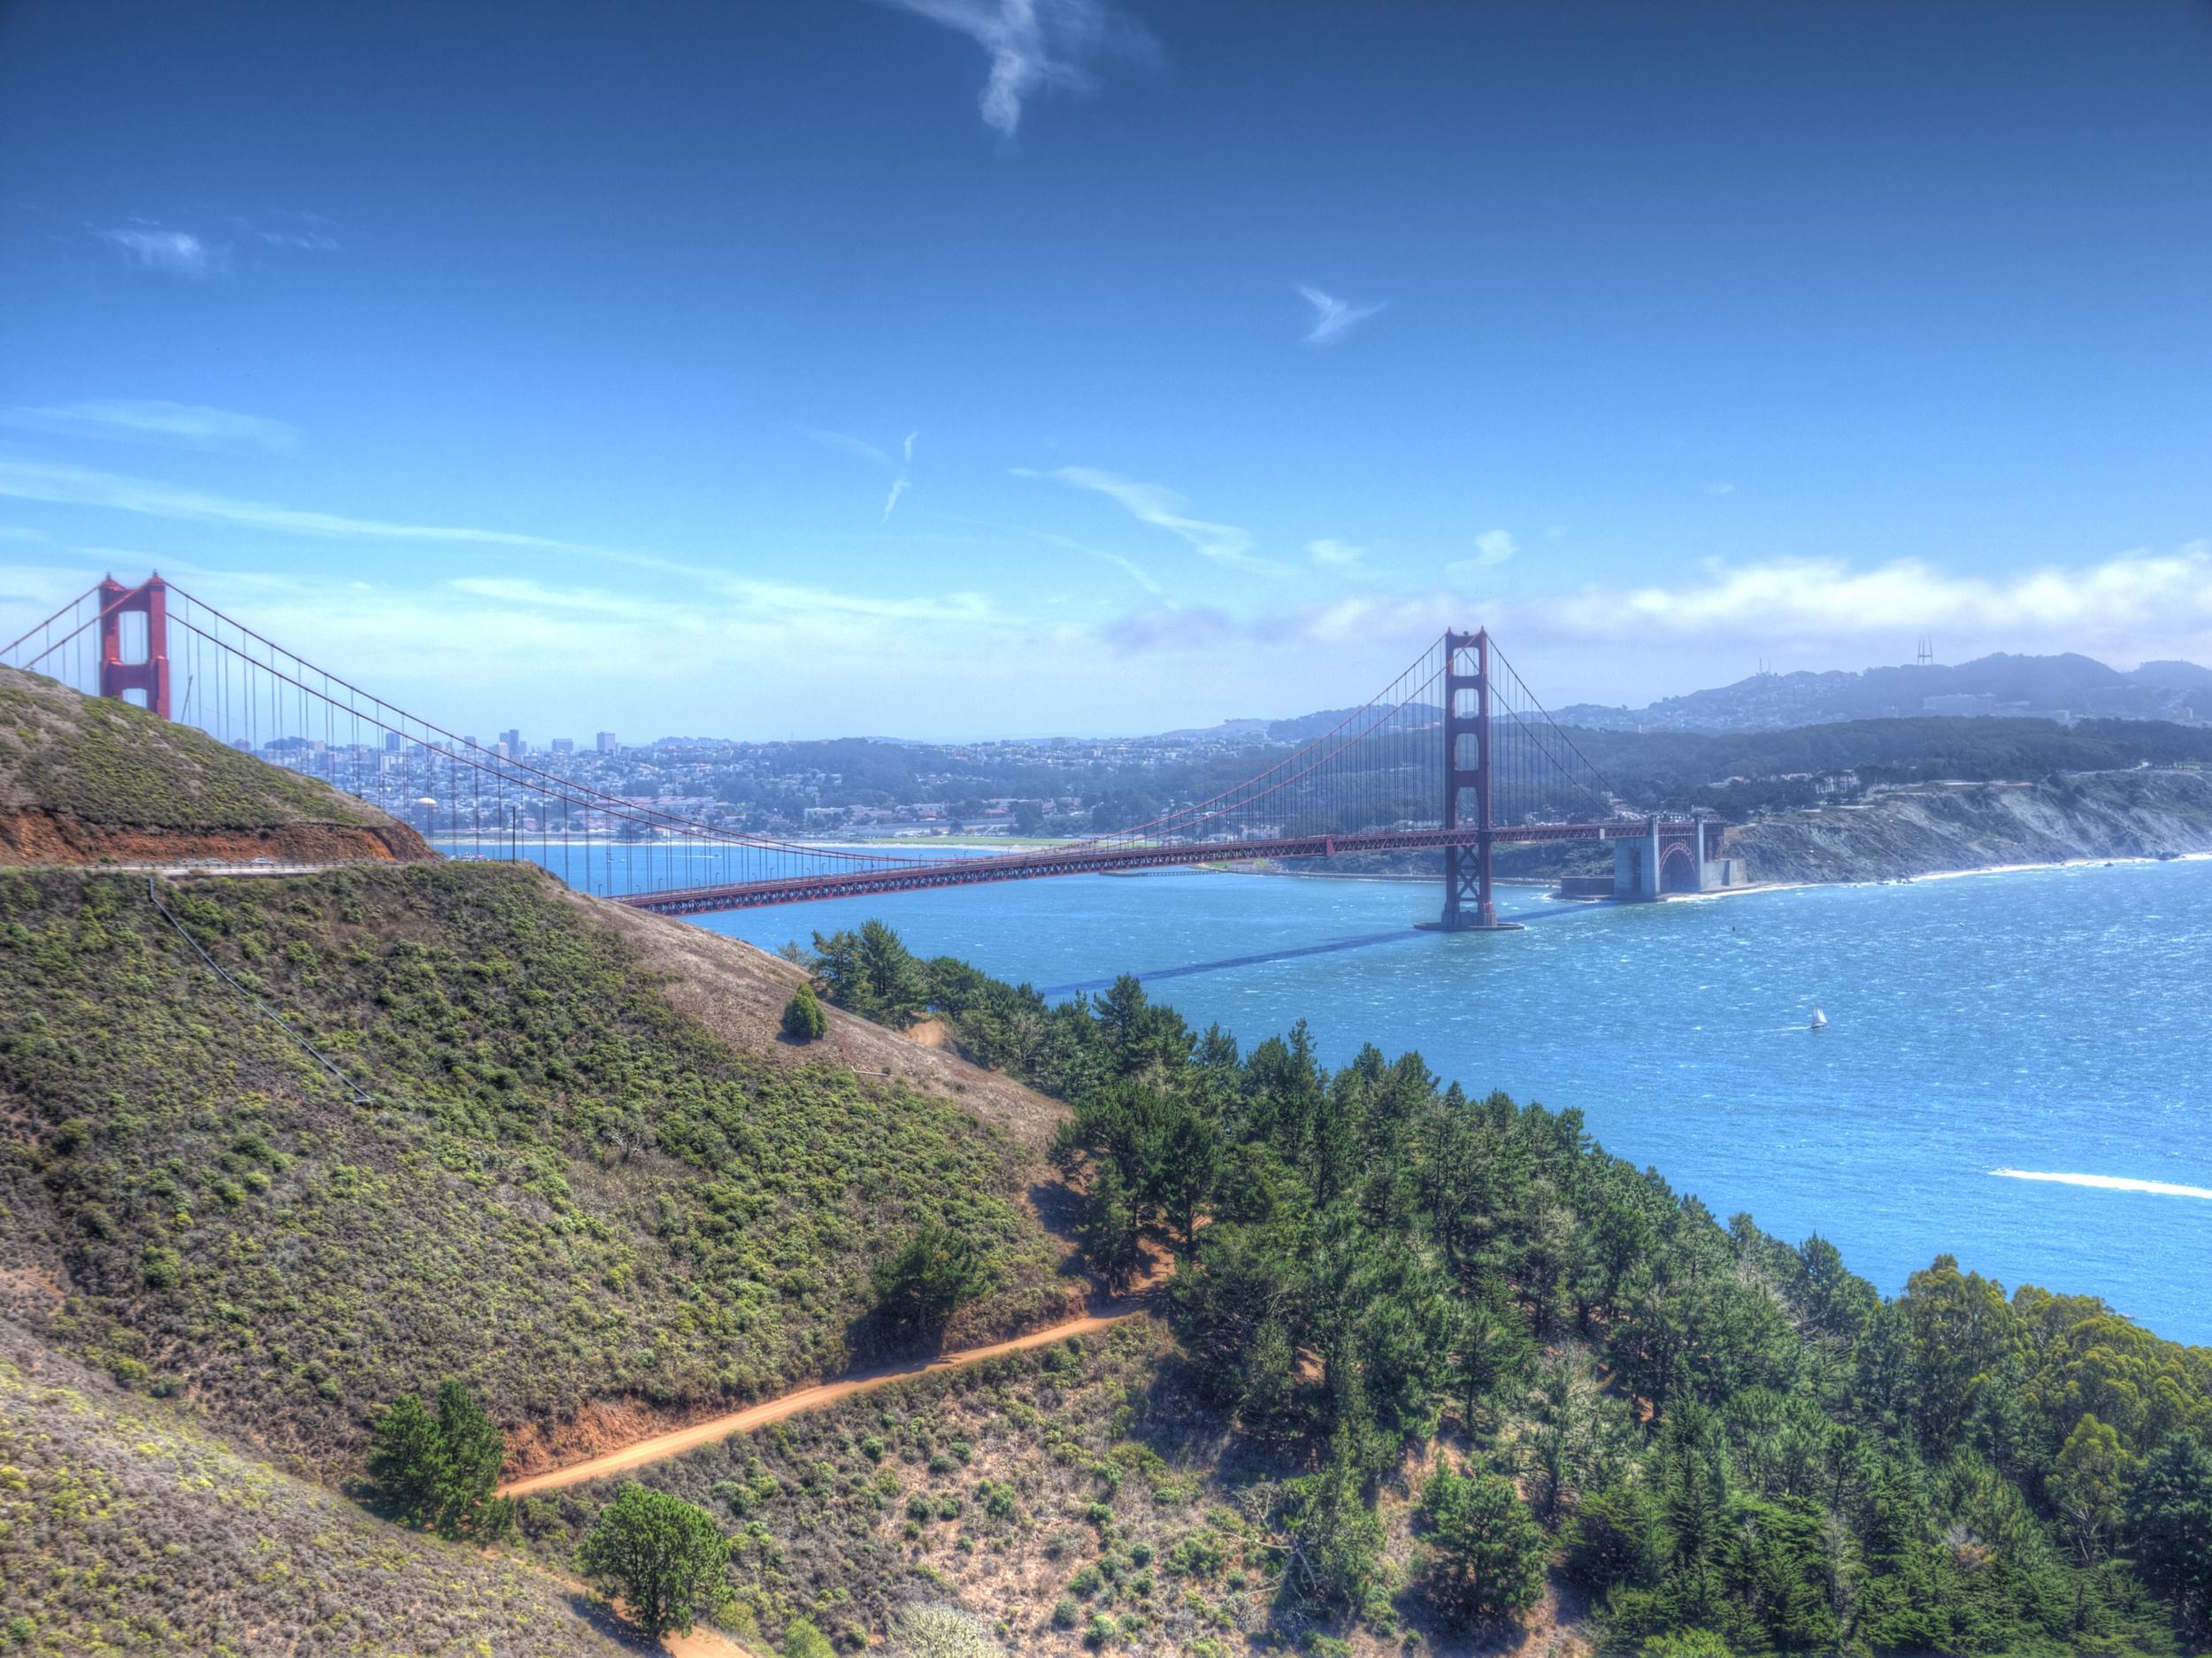 Golden Gate Bridge and San Francisco beyond.